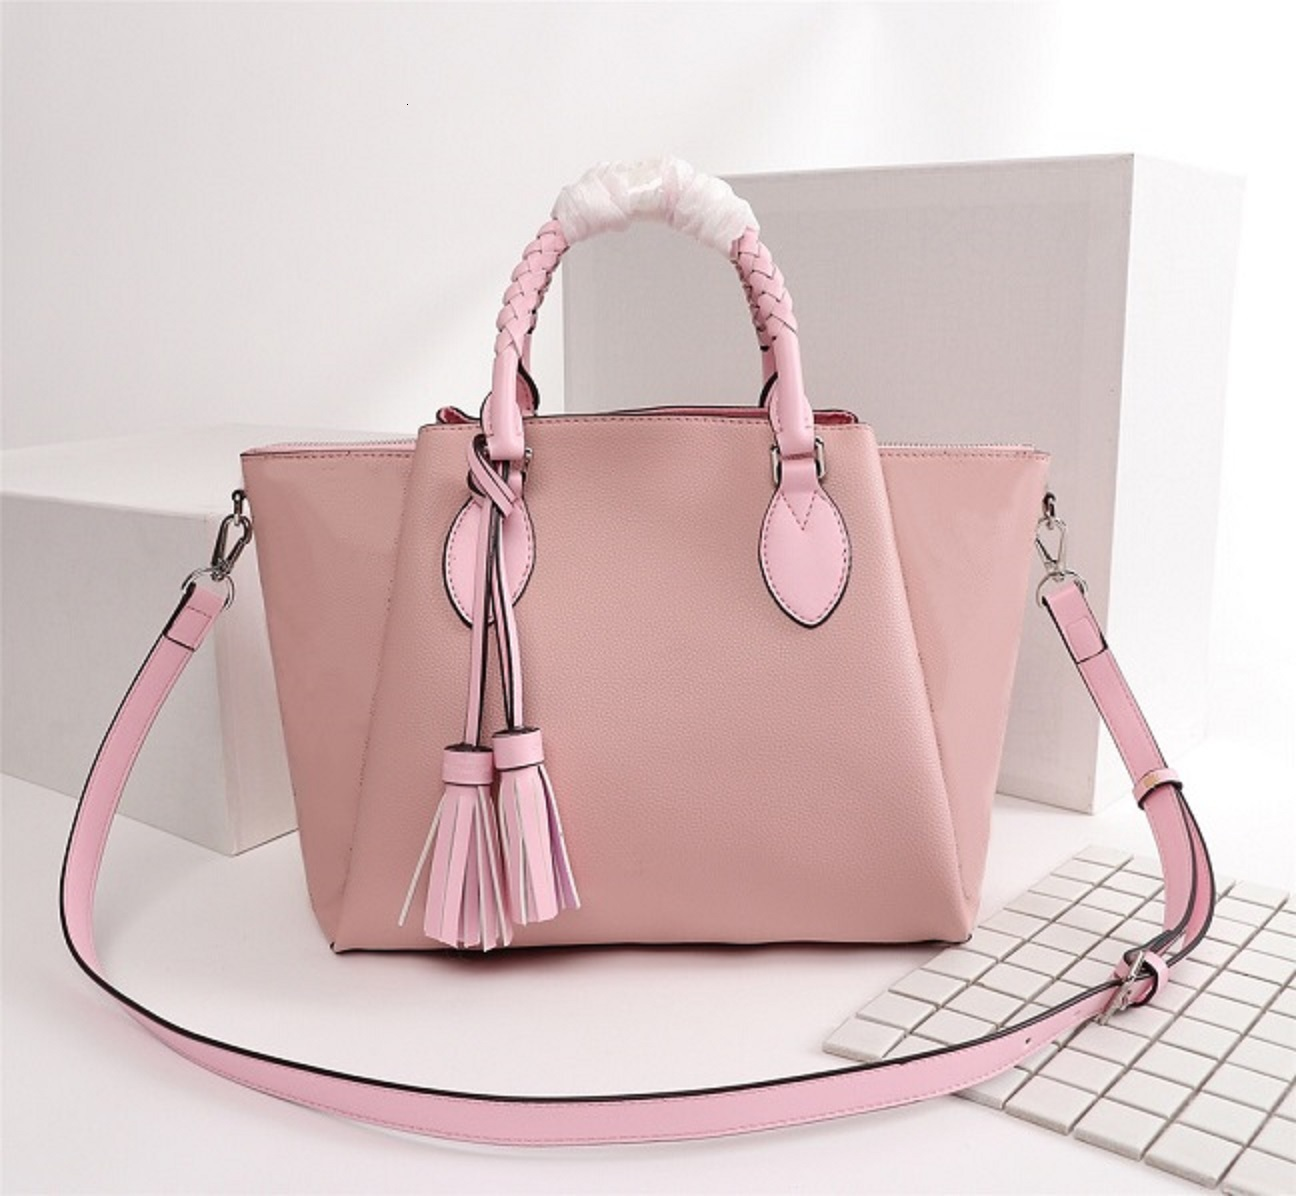 High quality bags HAUMEA handbags shoulder bag high quality Cross Body bags fashion bags bag shopping mini bag